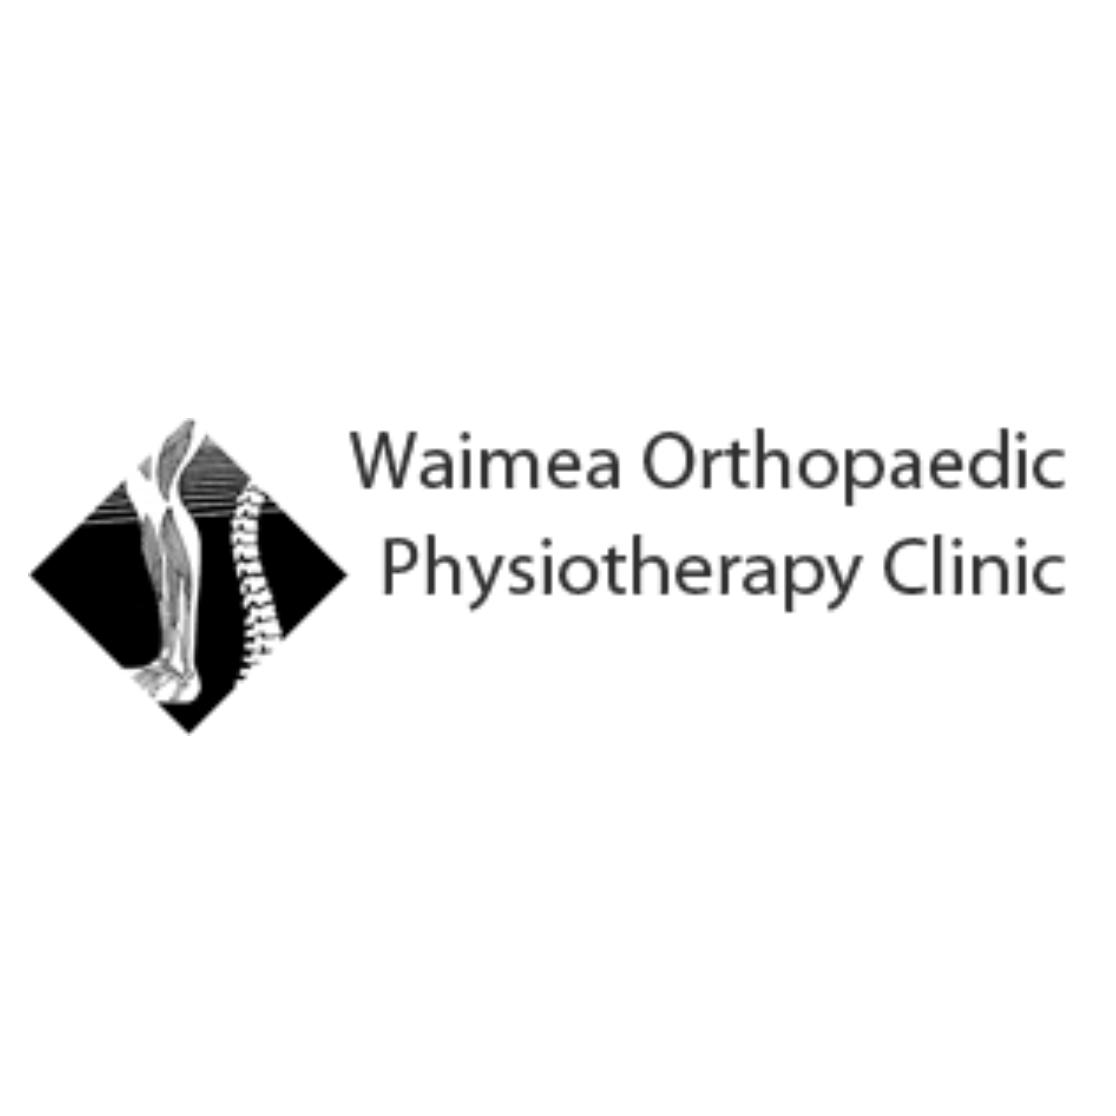 waimea orthopaedic.png